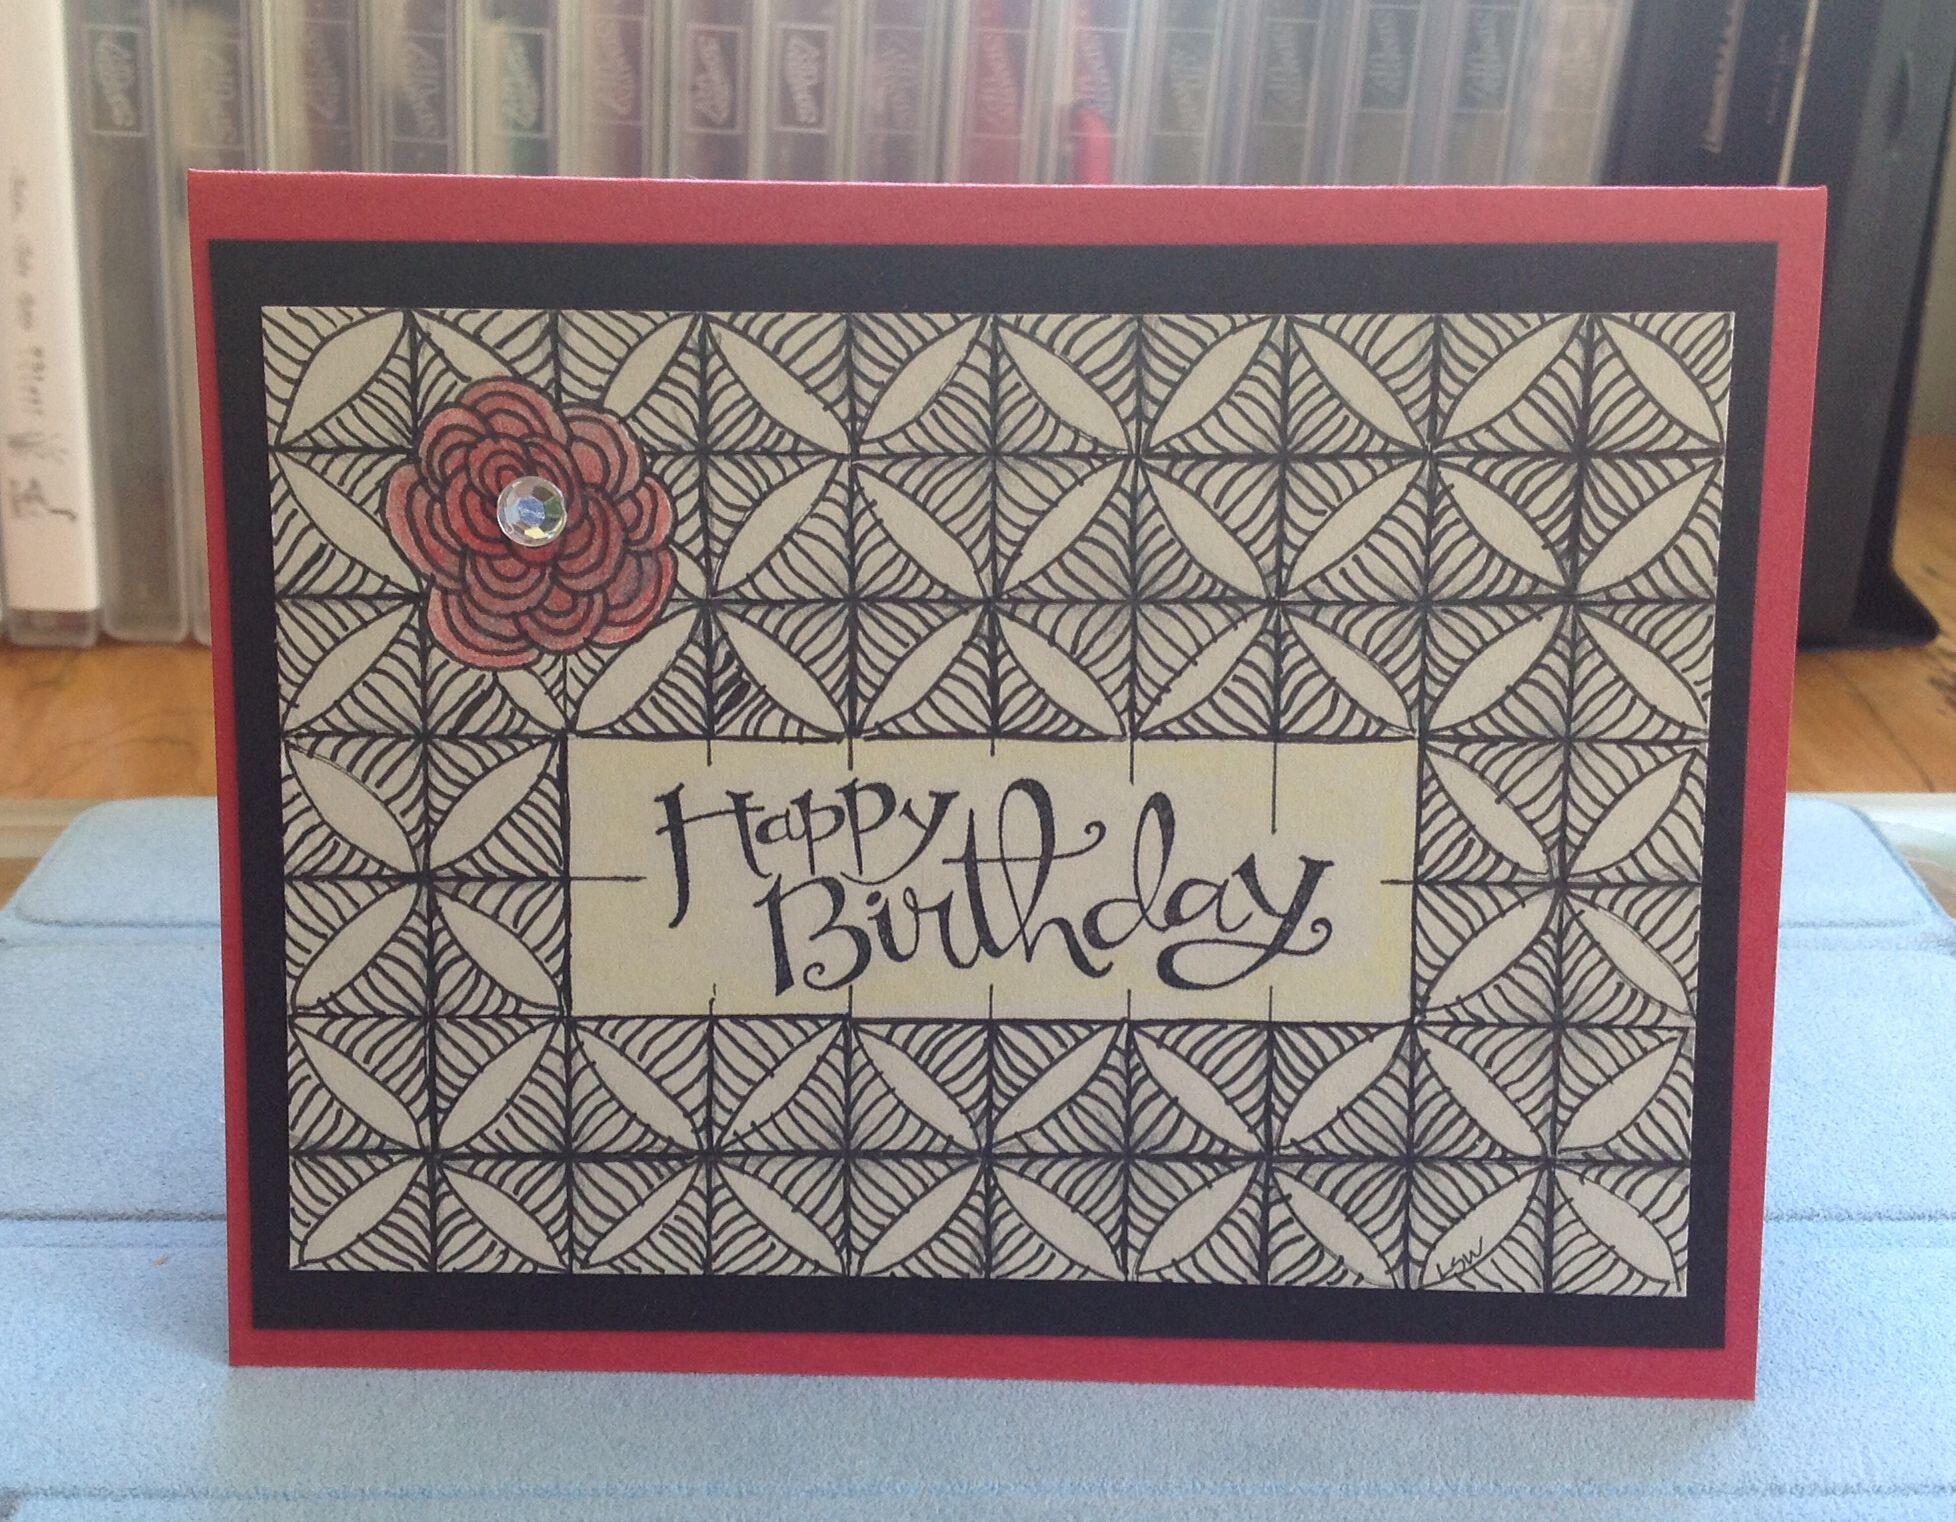 Zentangle background birthday card. 6/15/2014 | Cards | Pinterest